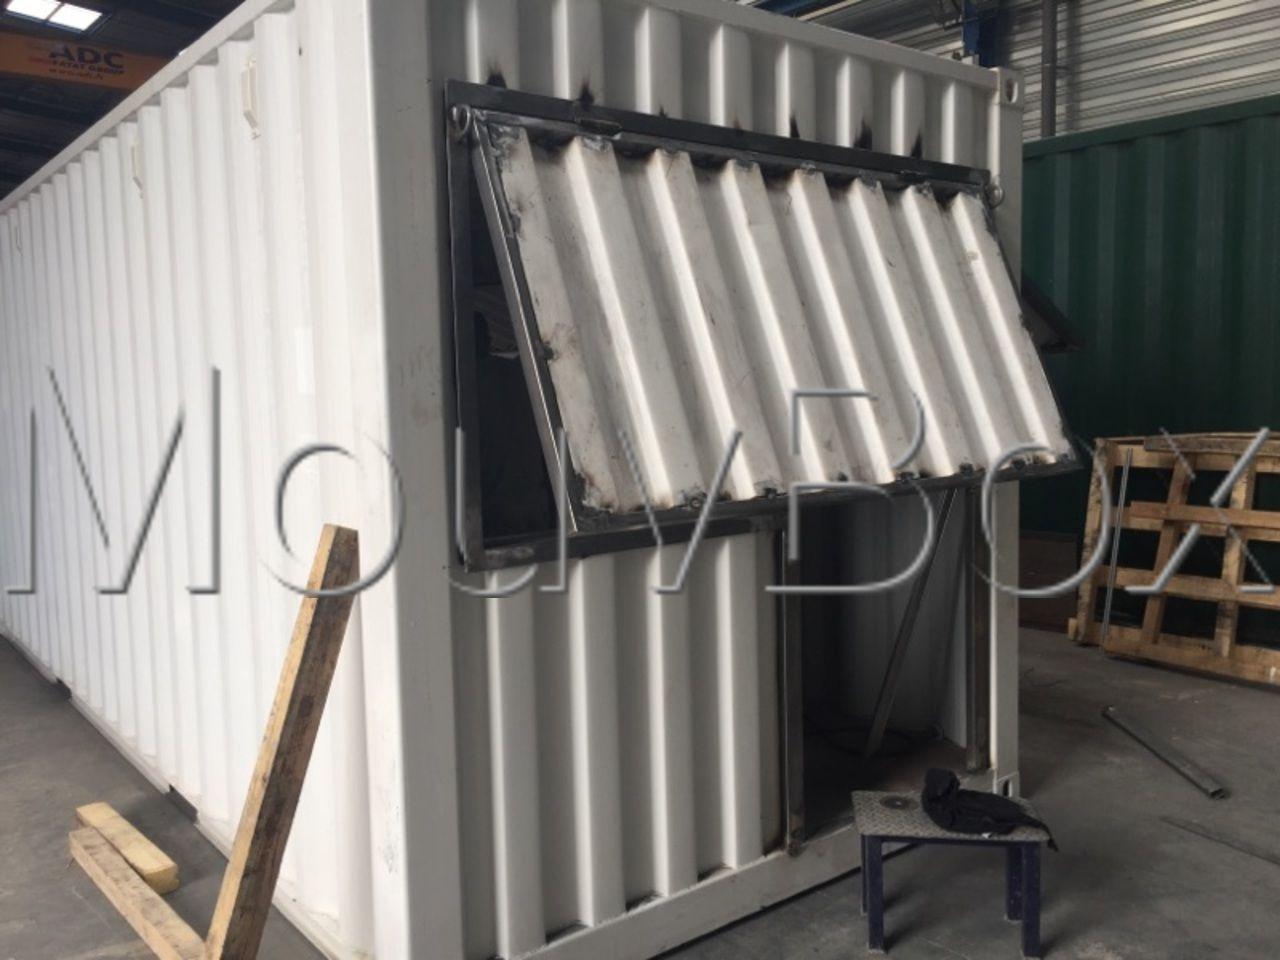 atelier-conception-realisation-transformation-conteneur-container-snack-box-vente-mouvbox